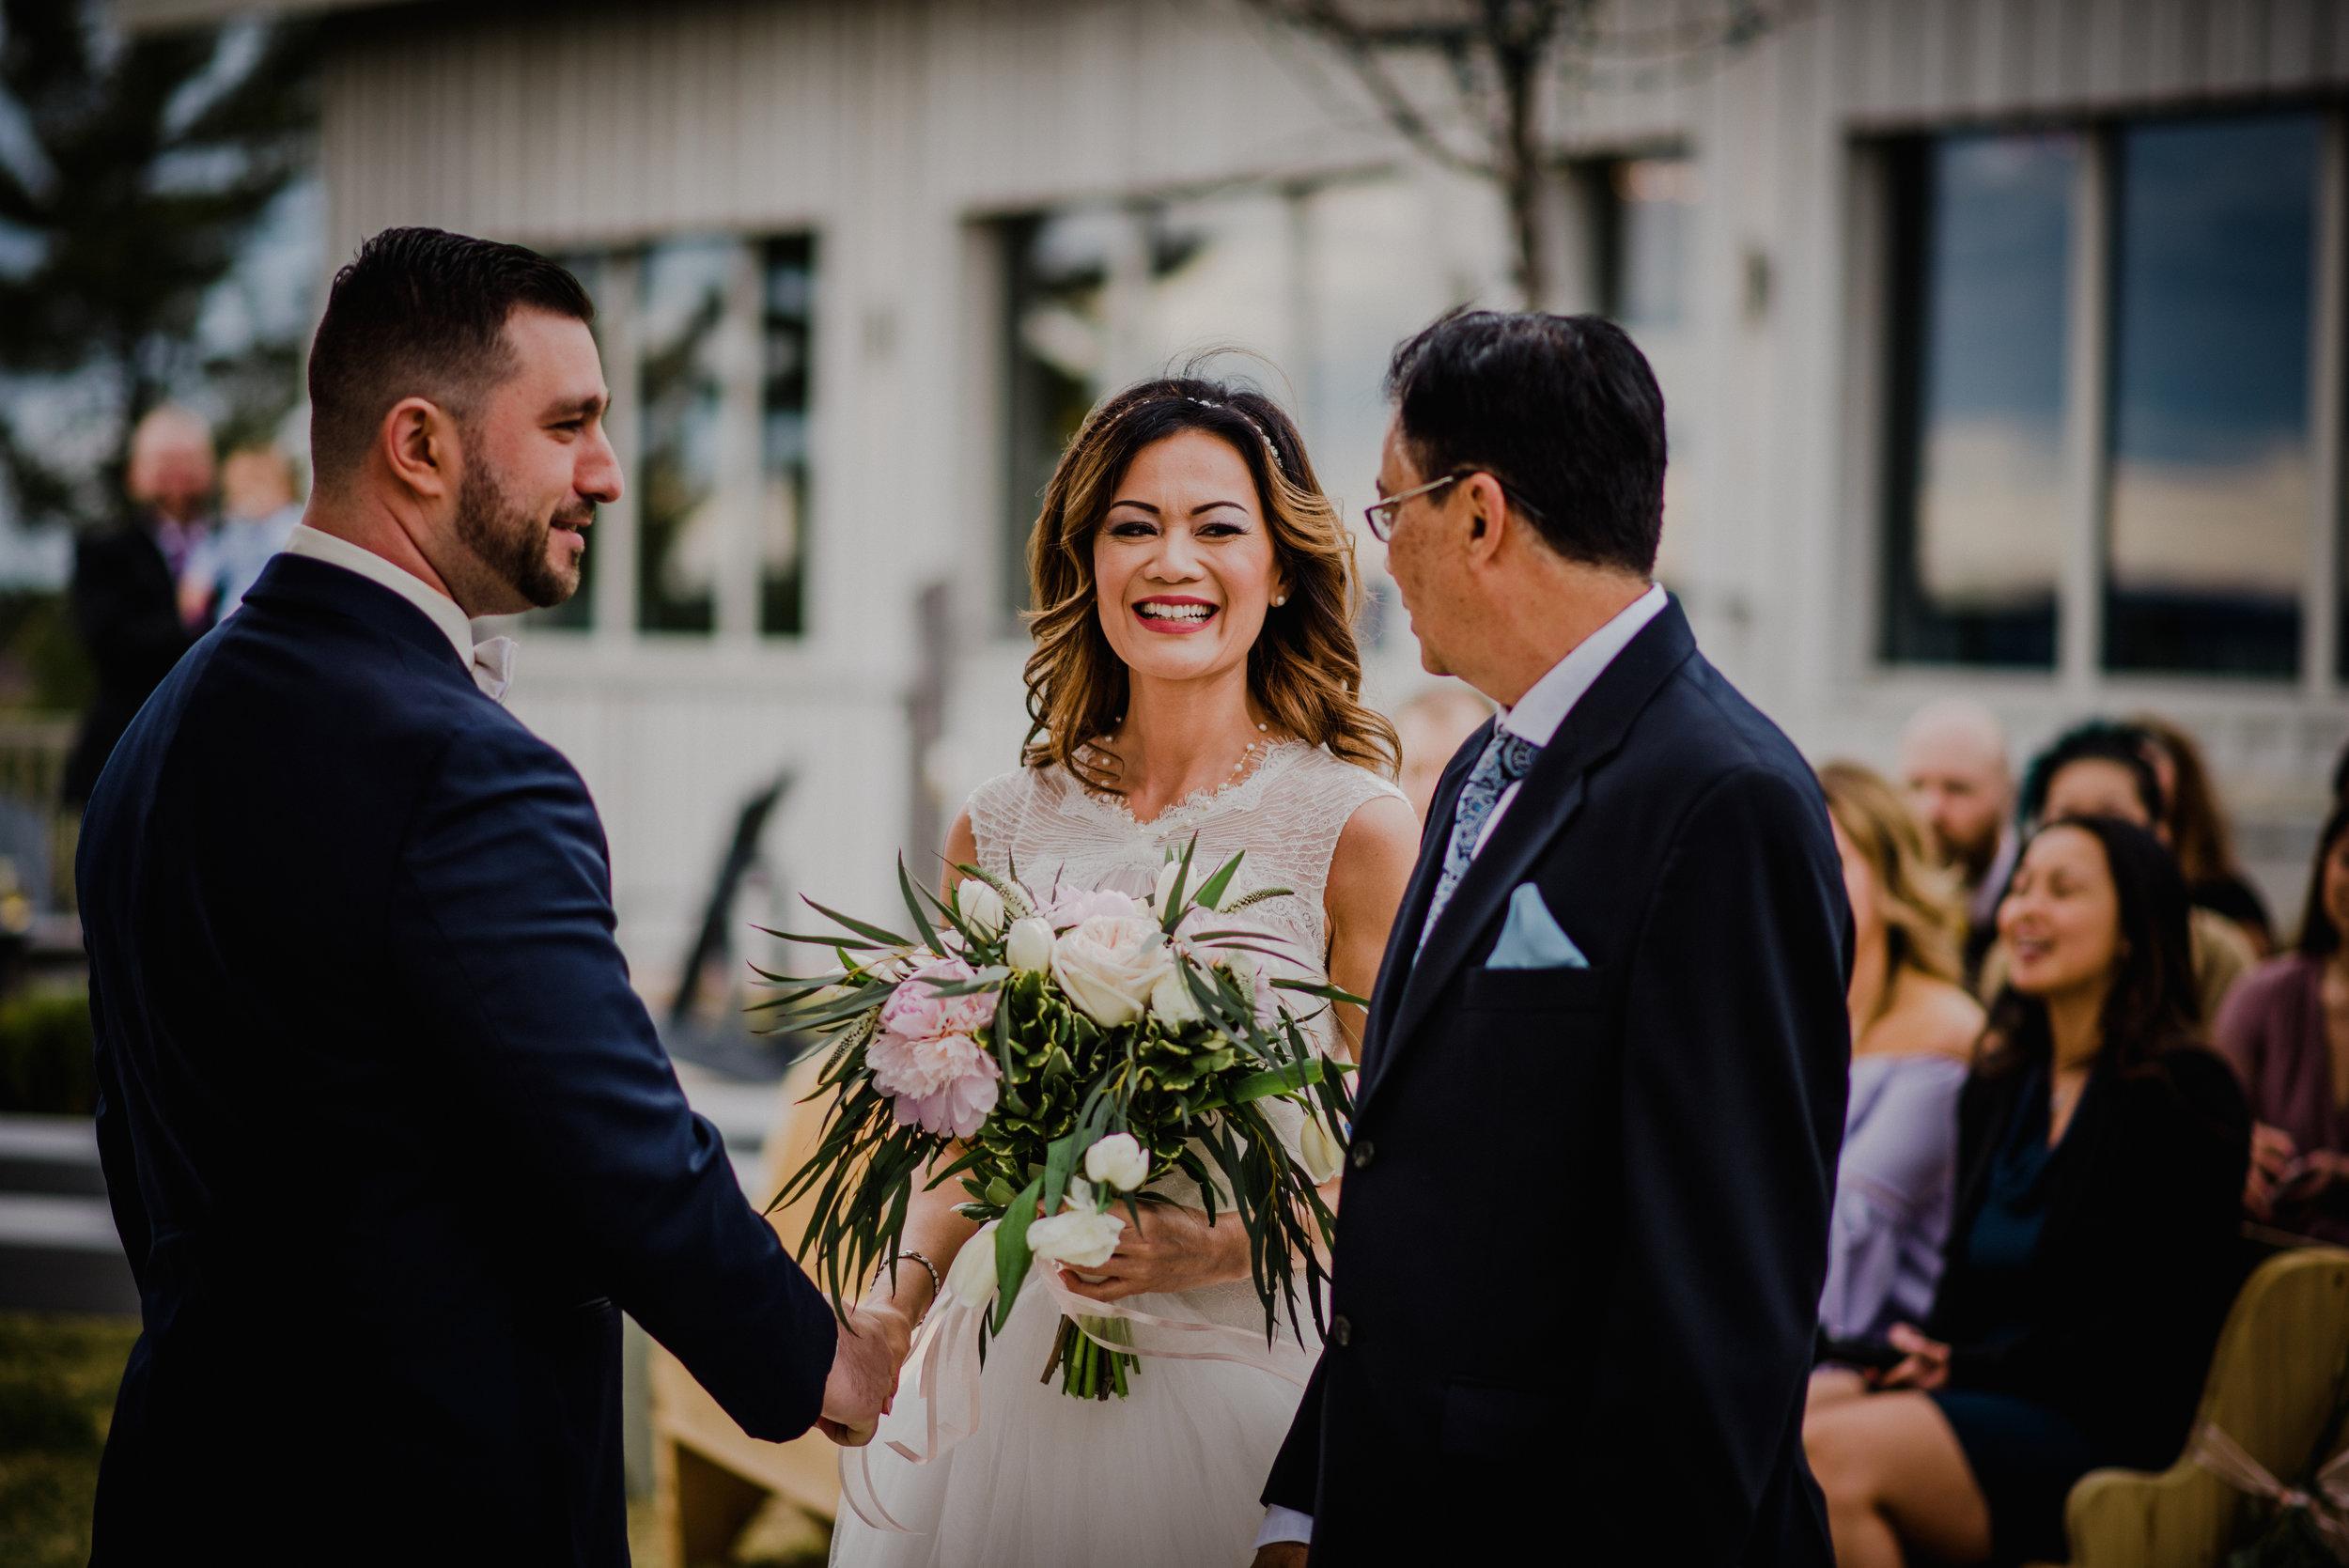 e Belvedere, Wakefield Wedding - Ceremony 4